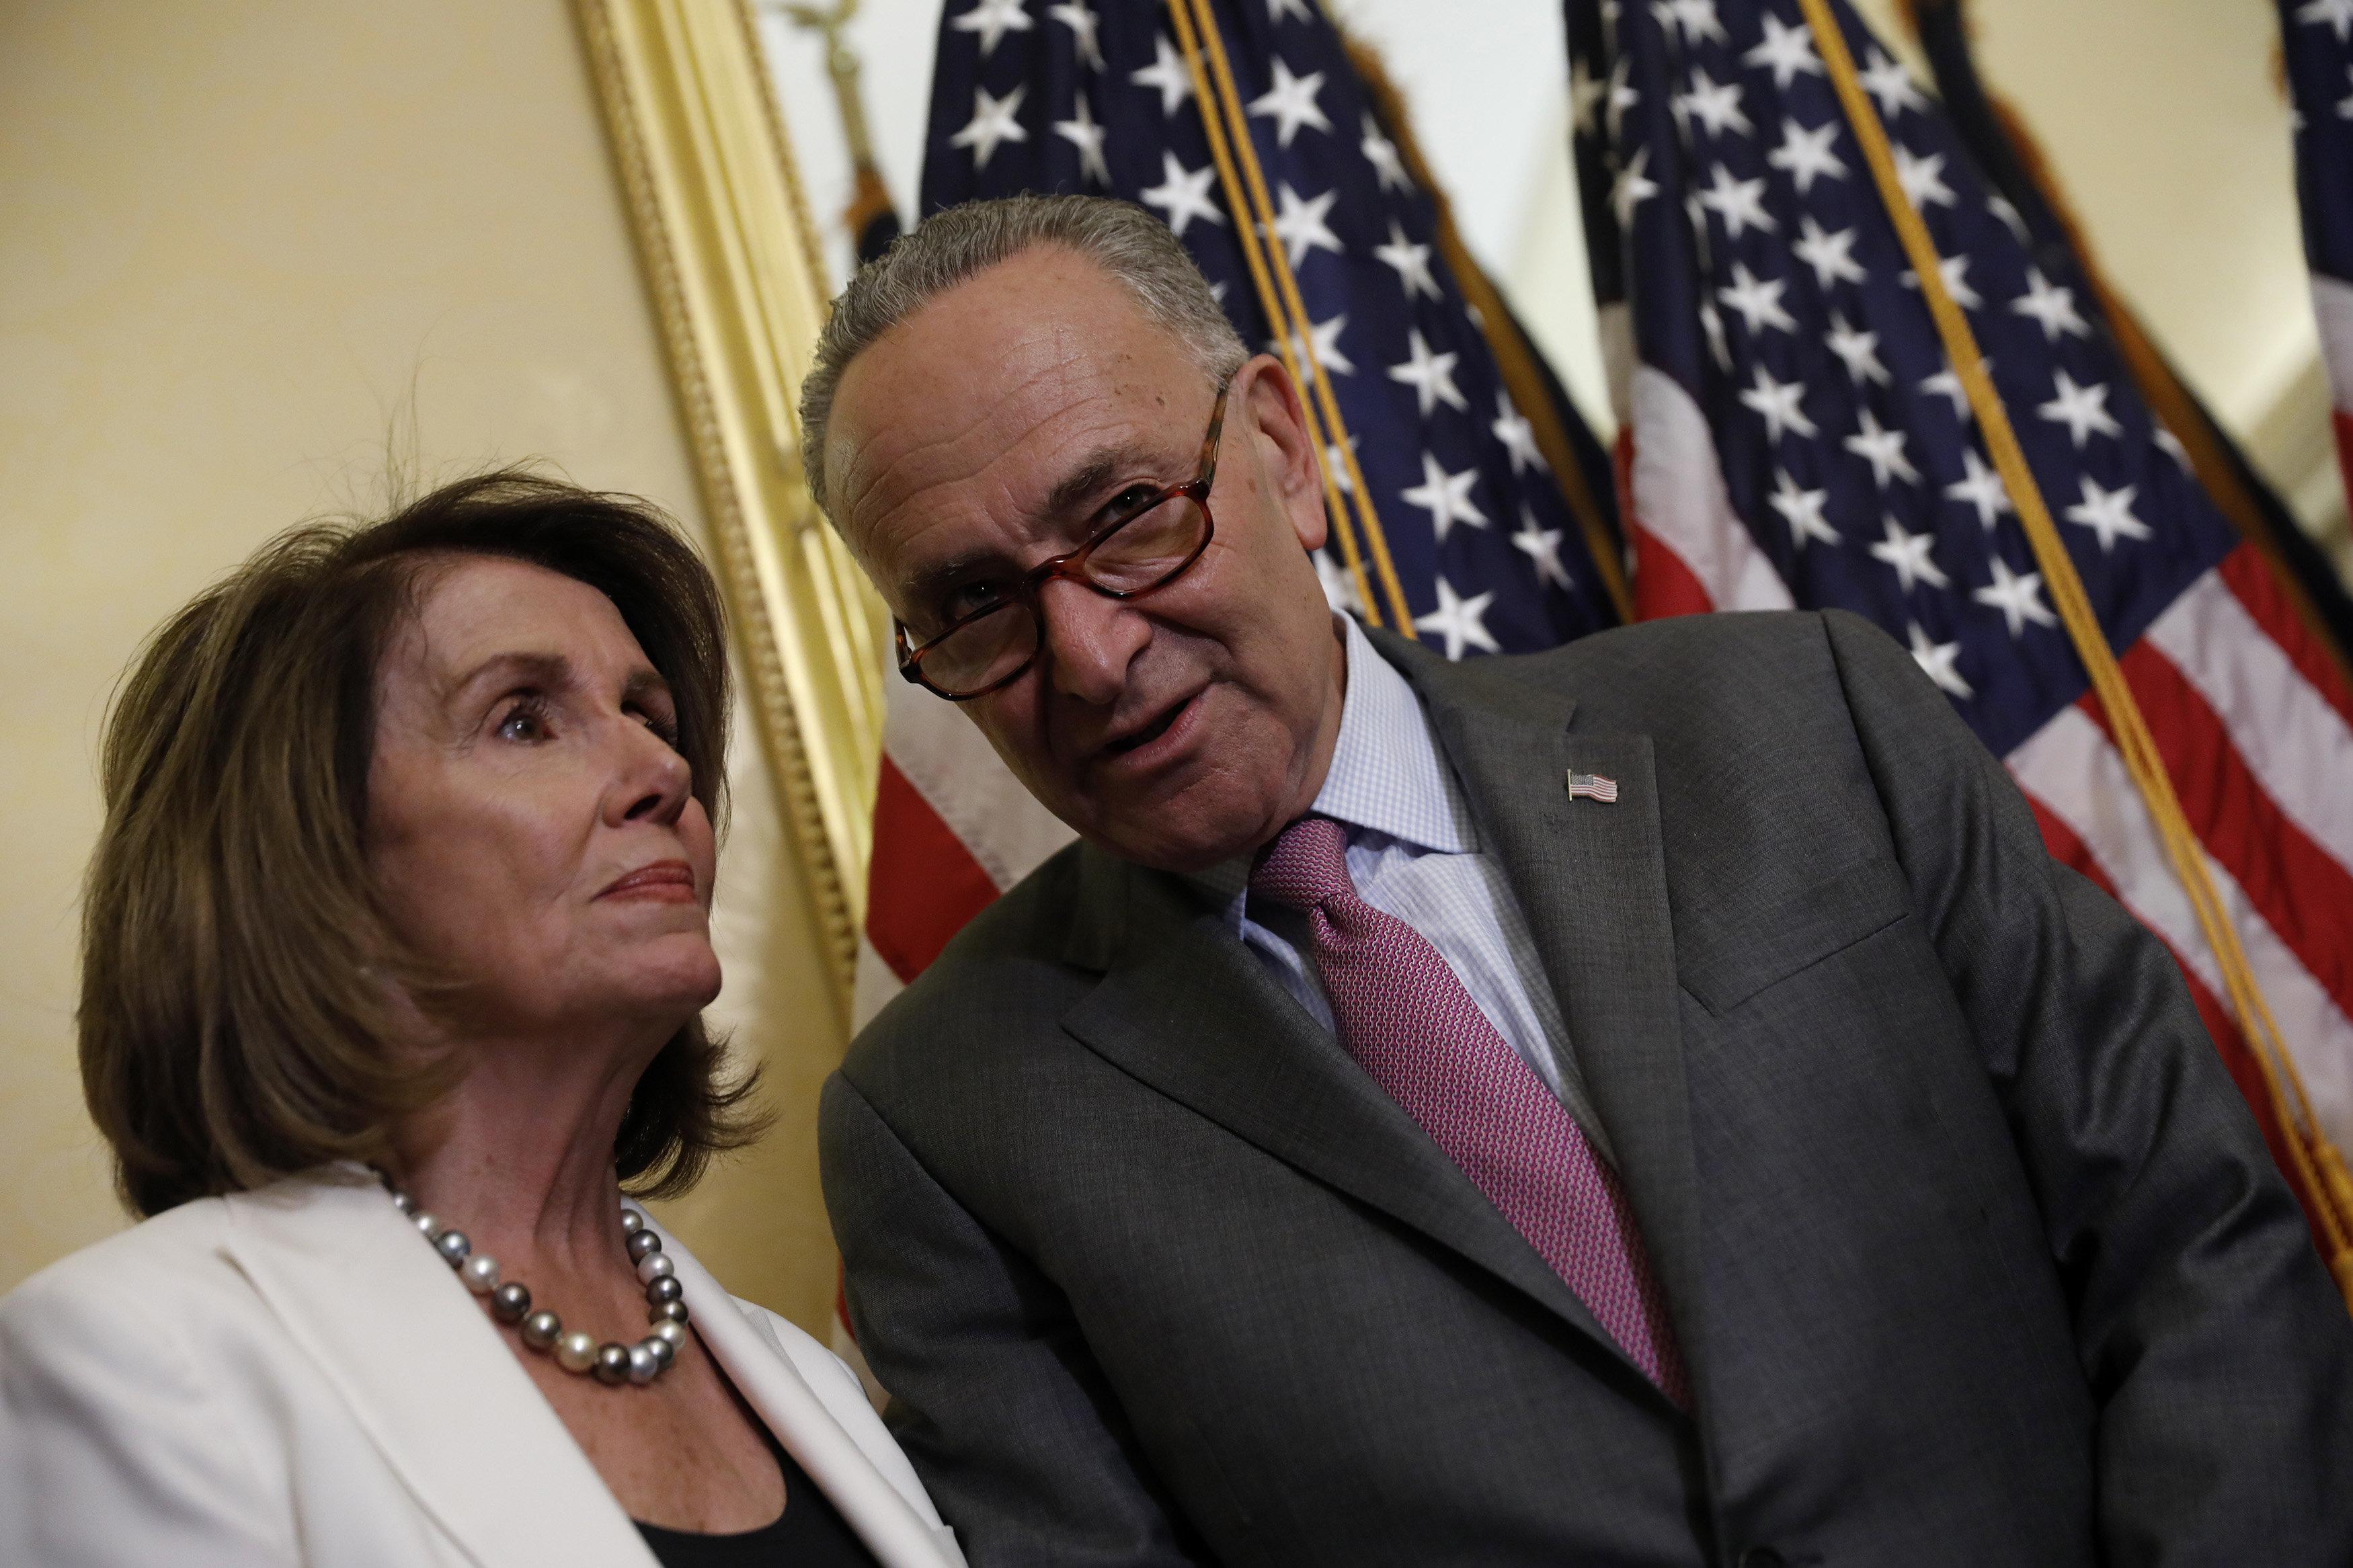 Senate Minority Leader Chuck Schumer (D-N.Y.) andHouse Minority Leader Nancy Pelosi (D-Calif.) said Wednesday they had